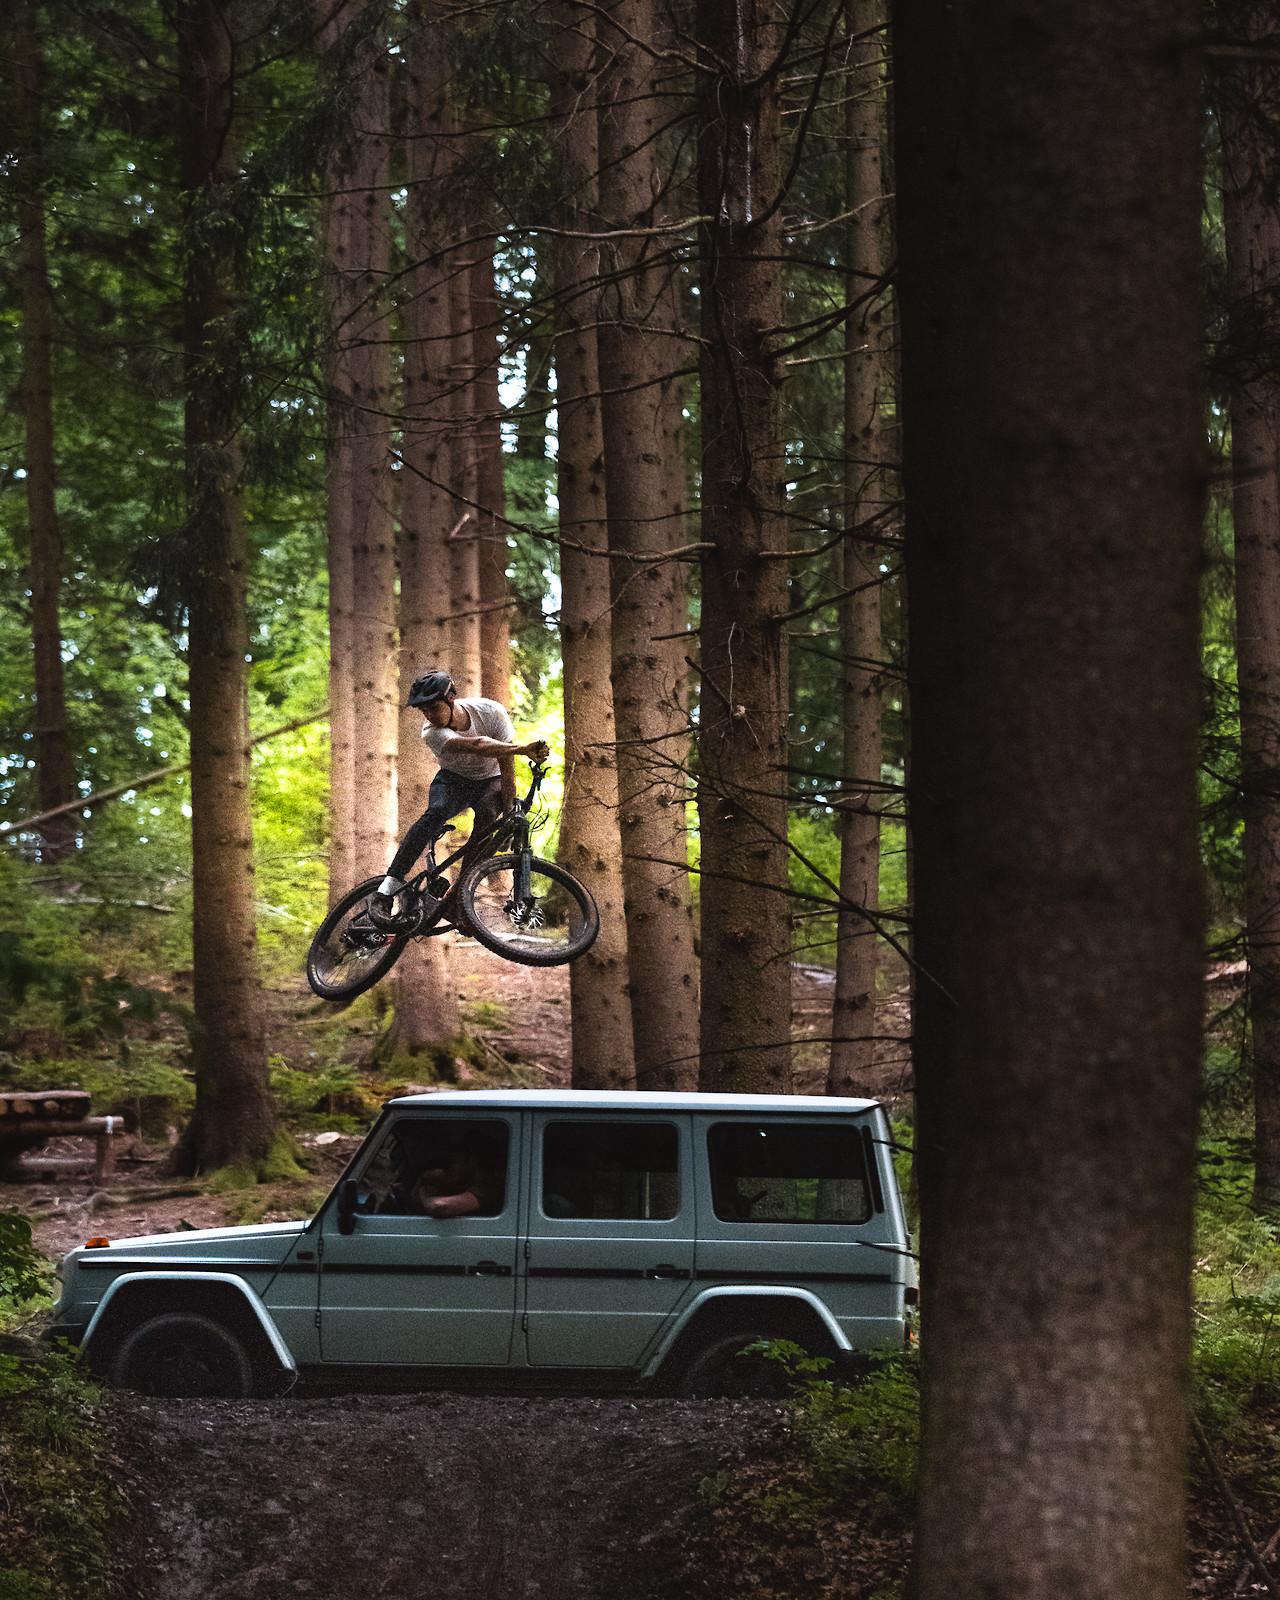 G Wagon Gap - Korbinian Engstler - Mountain Biking Pictures - Vital MTB